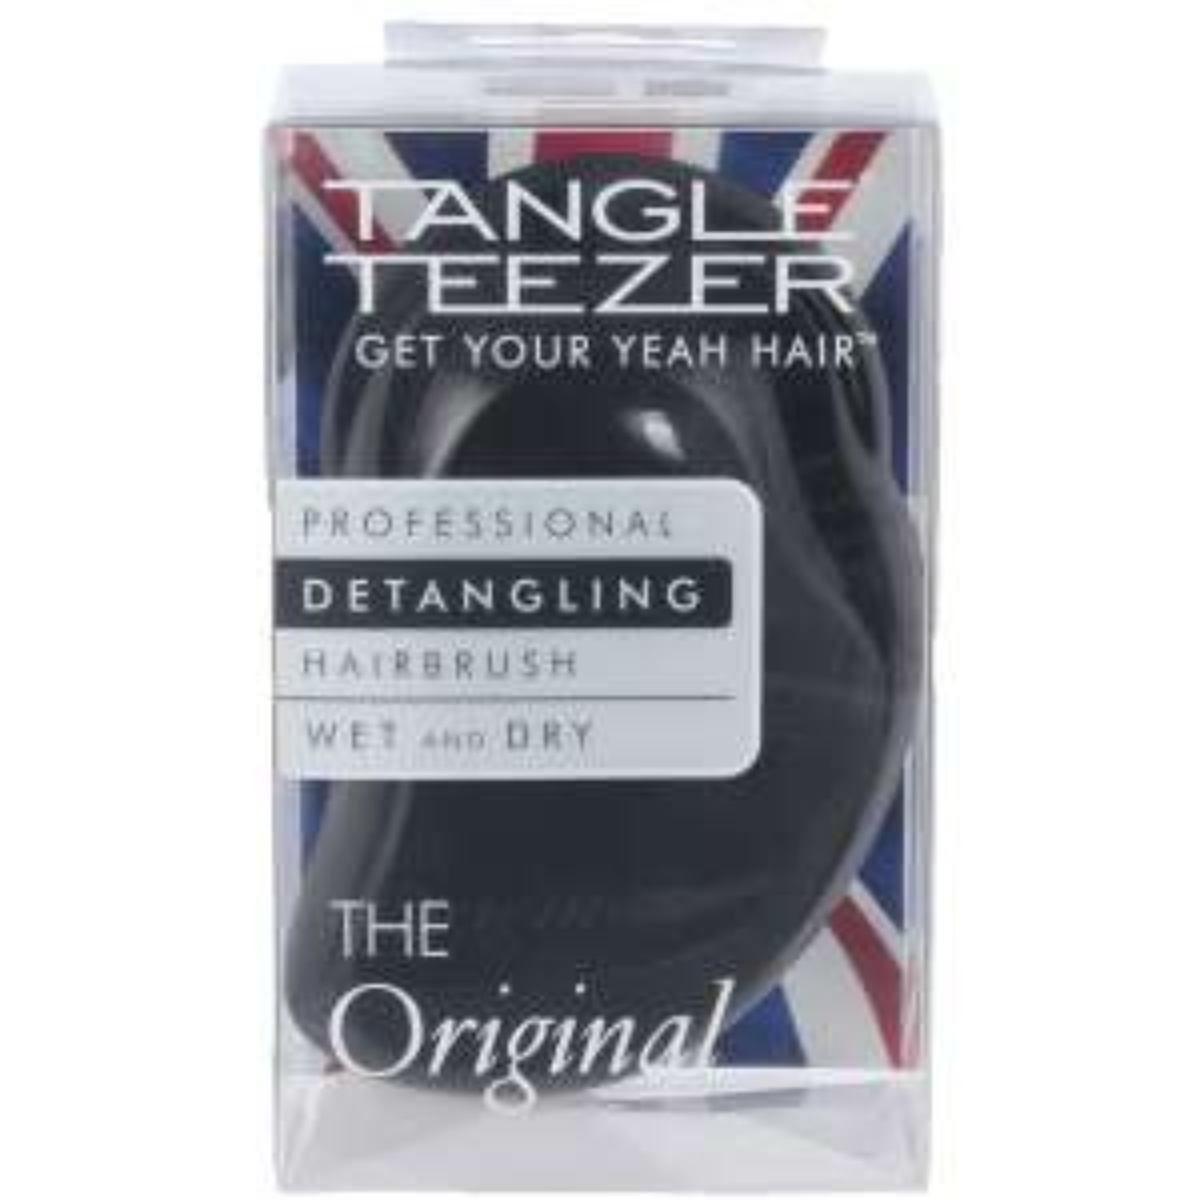 Original Tangle Teezer hairbrush £6 in store/C&C @ Robert Dyas